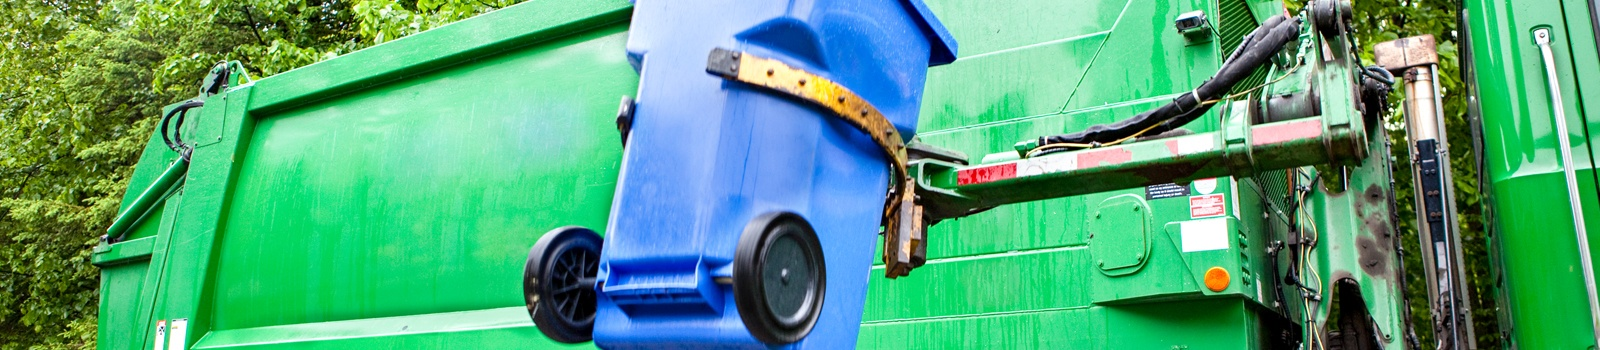 Waste Robot Arm Loading Garbage Truck